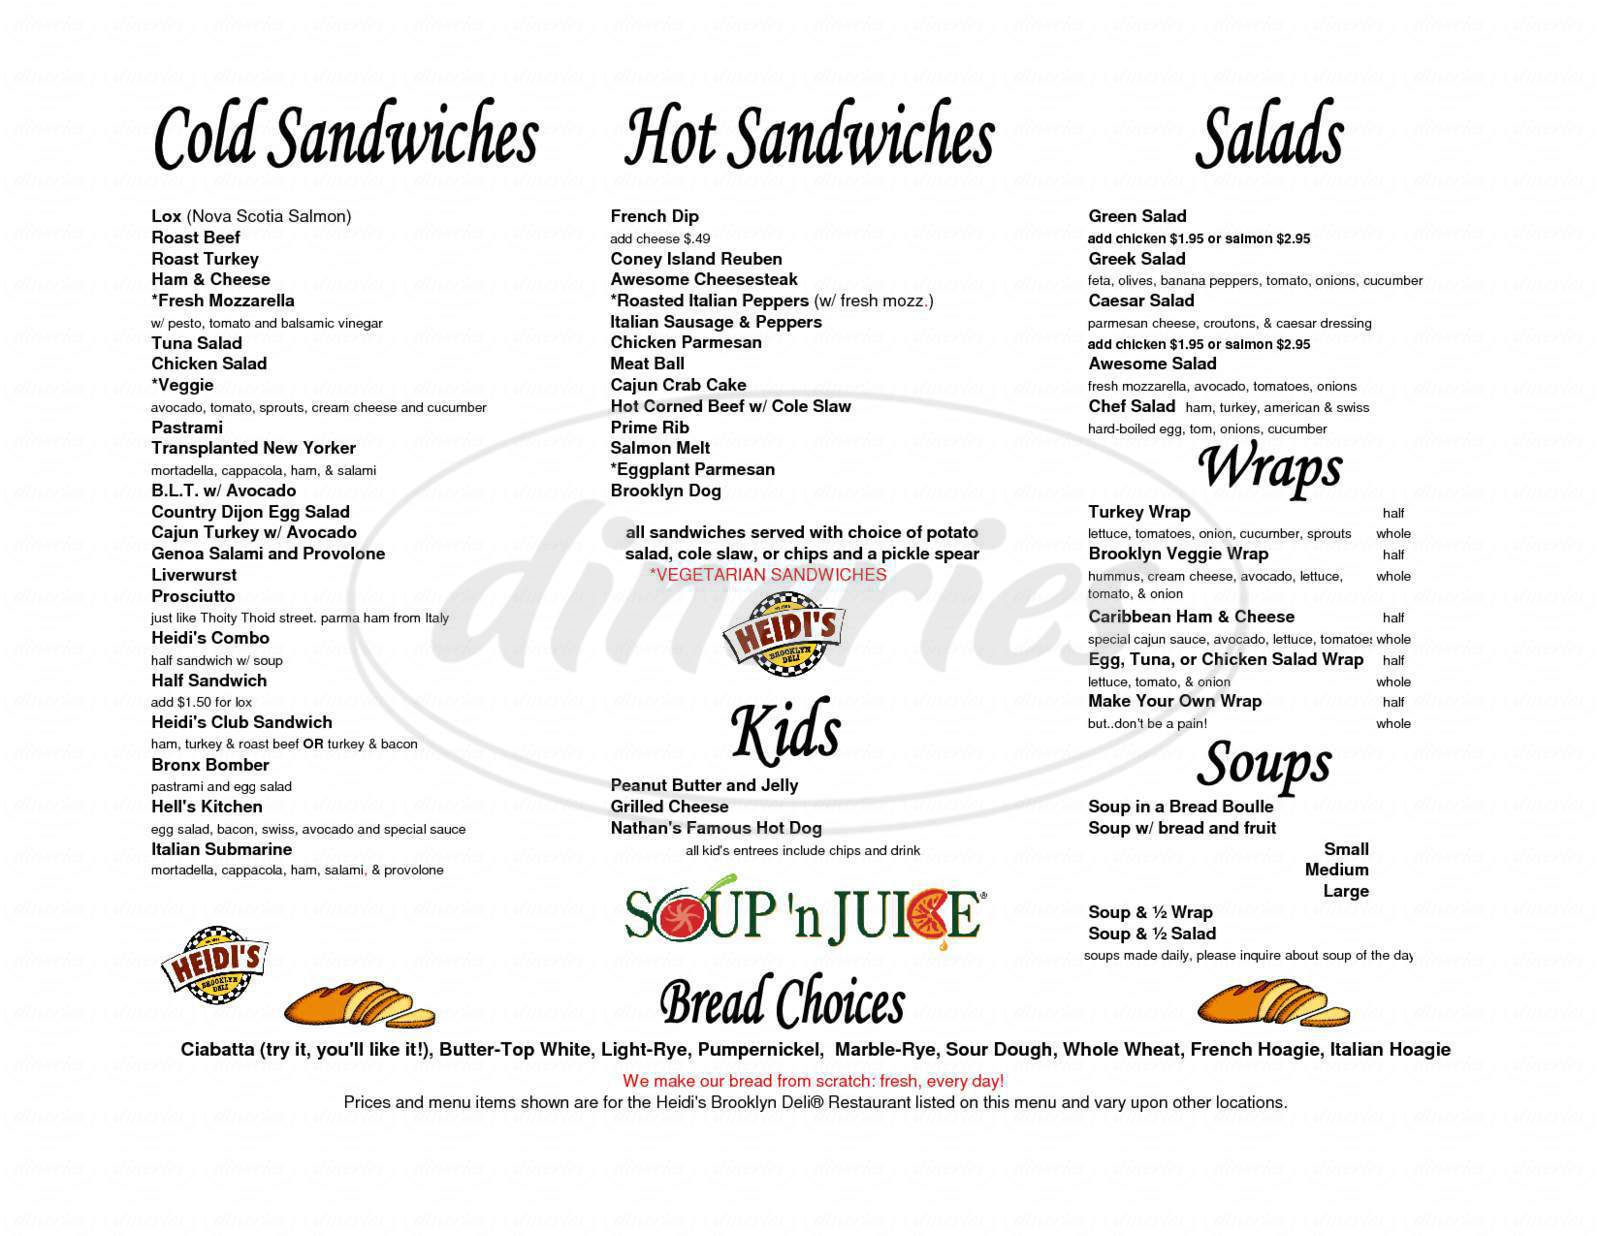 menu for Heidi's Brooklyn Deli